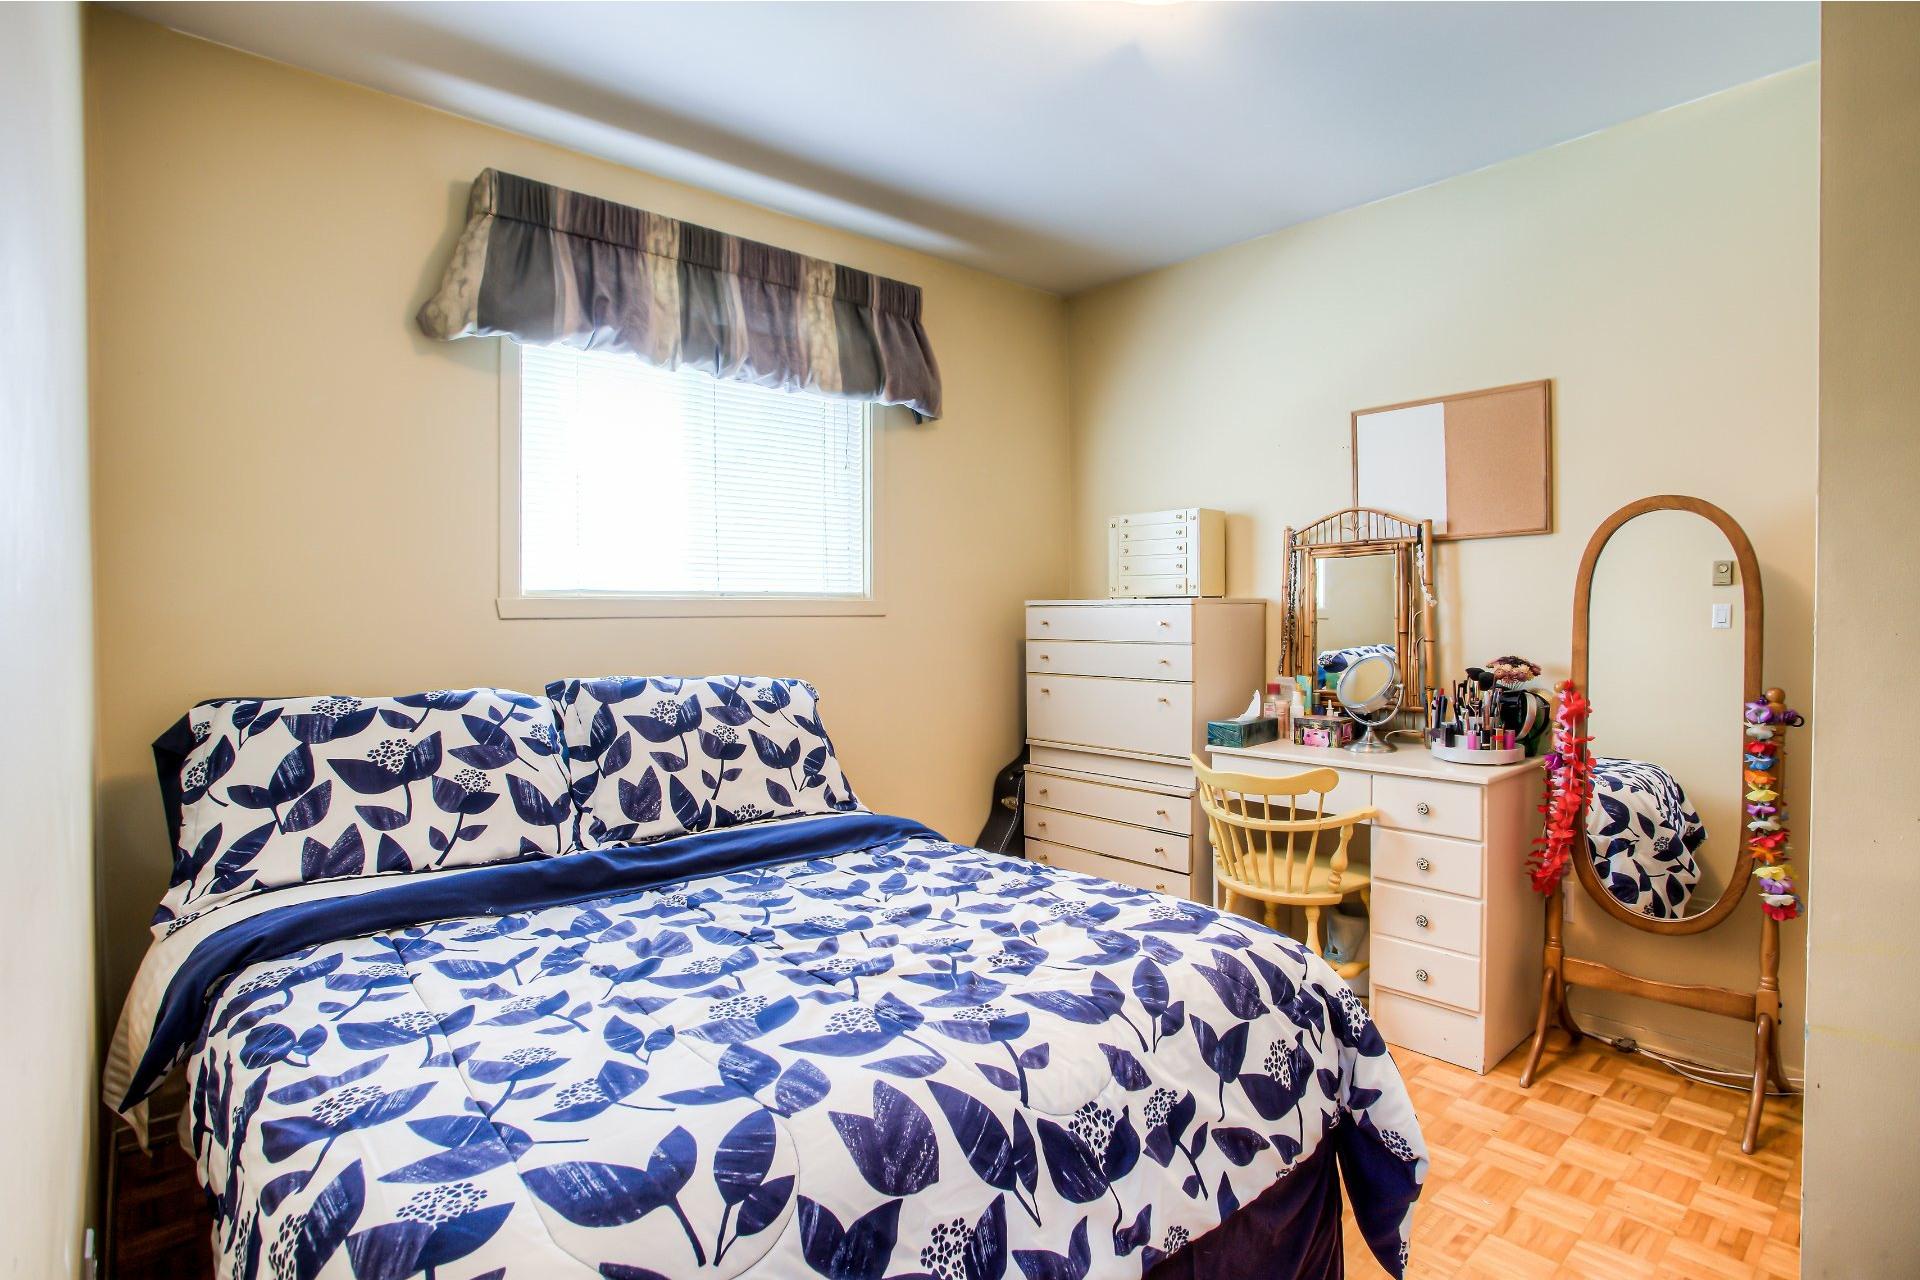 image 12 - MX - Casa sola - MX En venta Dollard-Des Ormeaux - 11 habitaciones